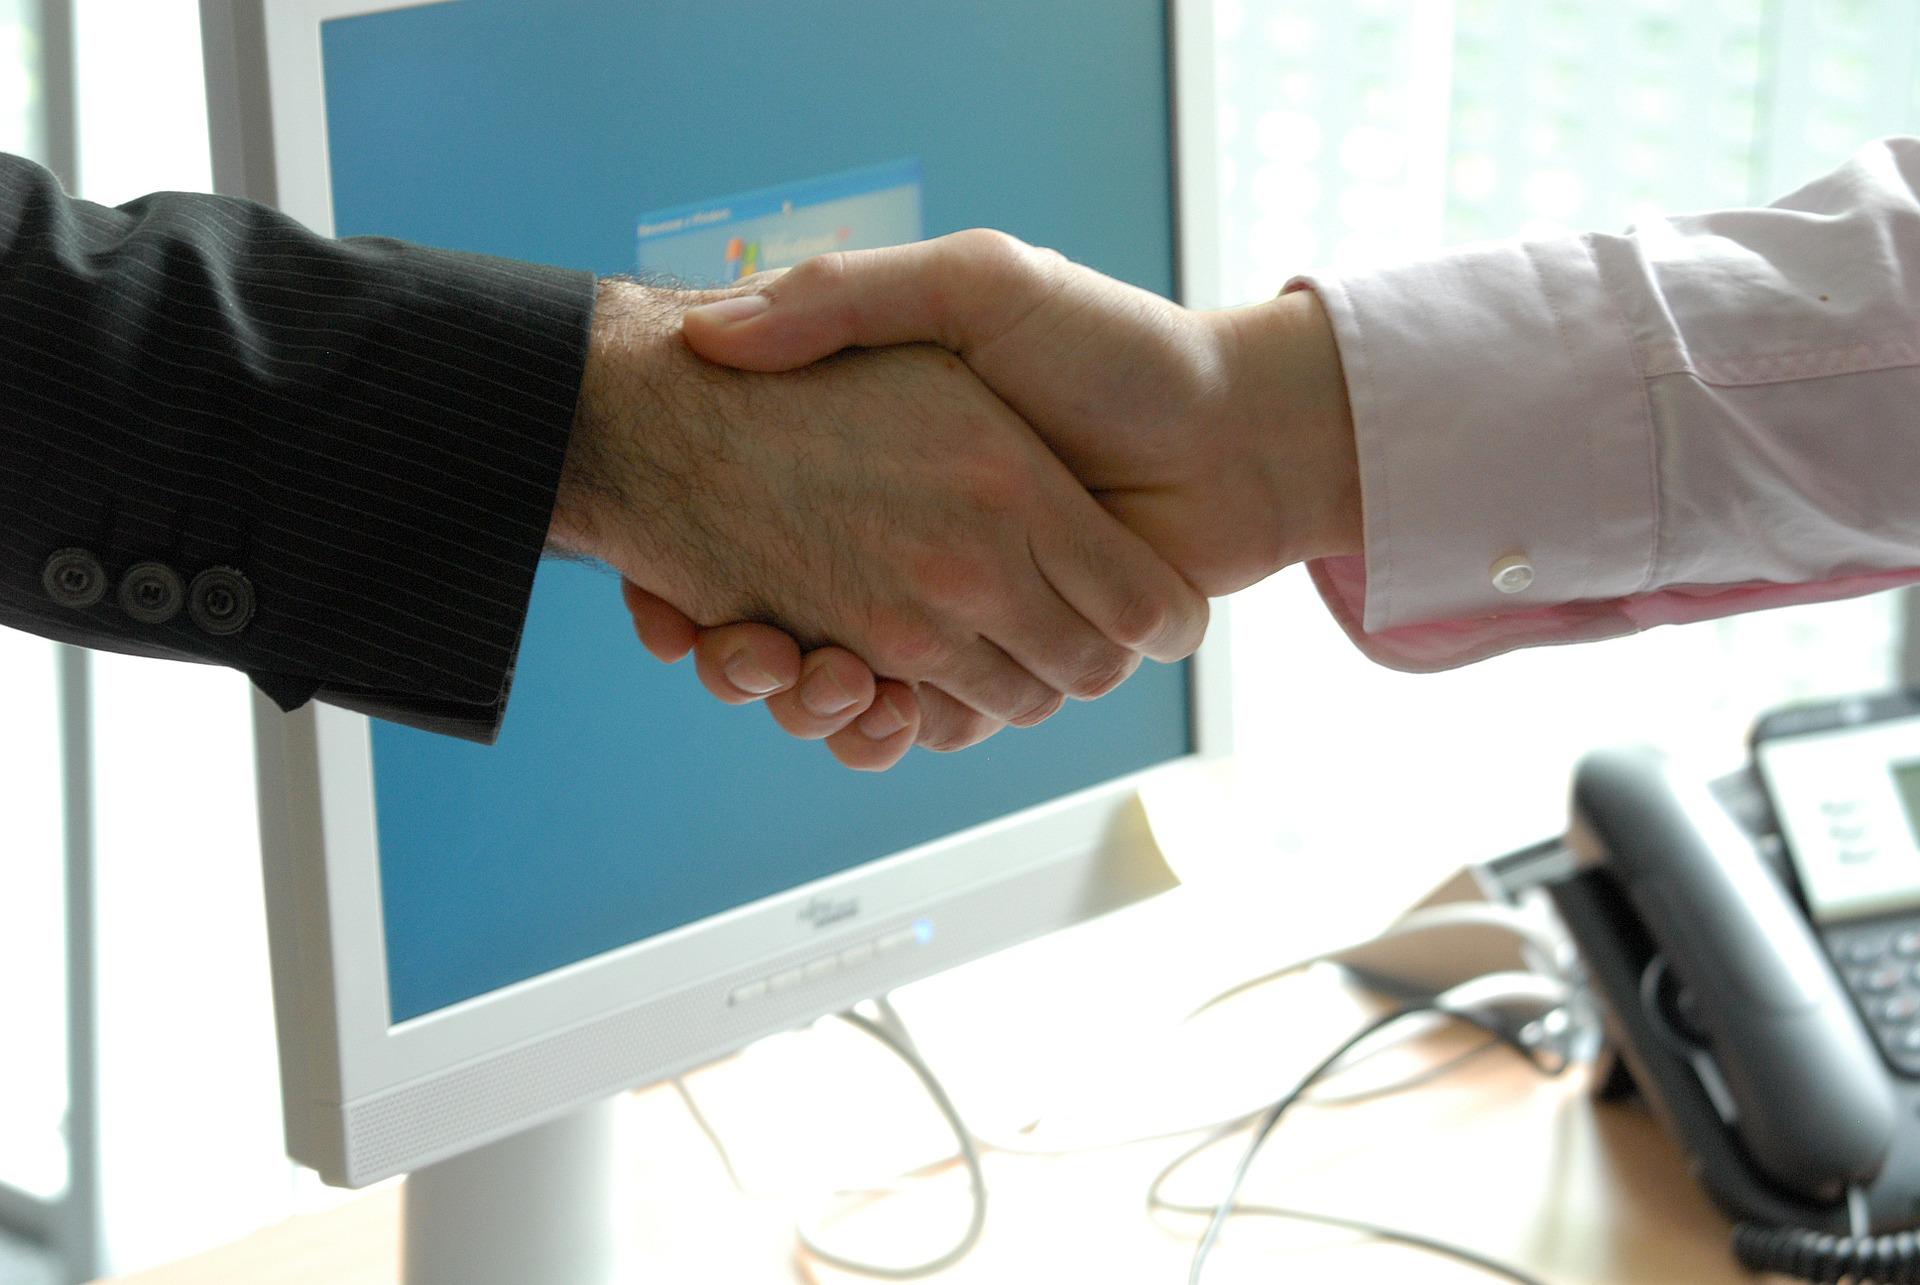 01_Pixabay_handshake-440959_1920